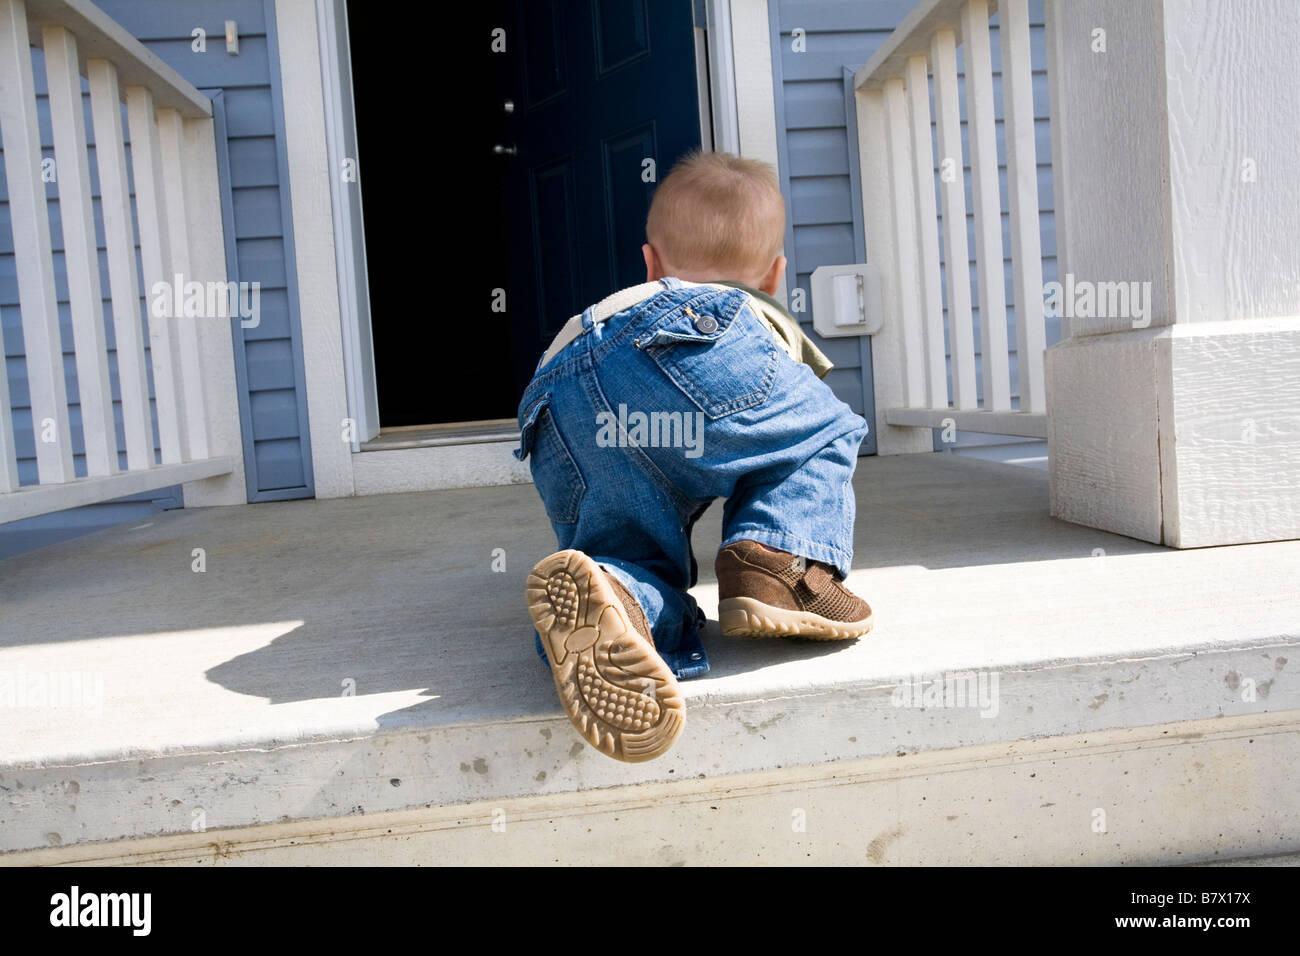 Enfant ramper vers la porte ouverte Photo Stock